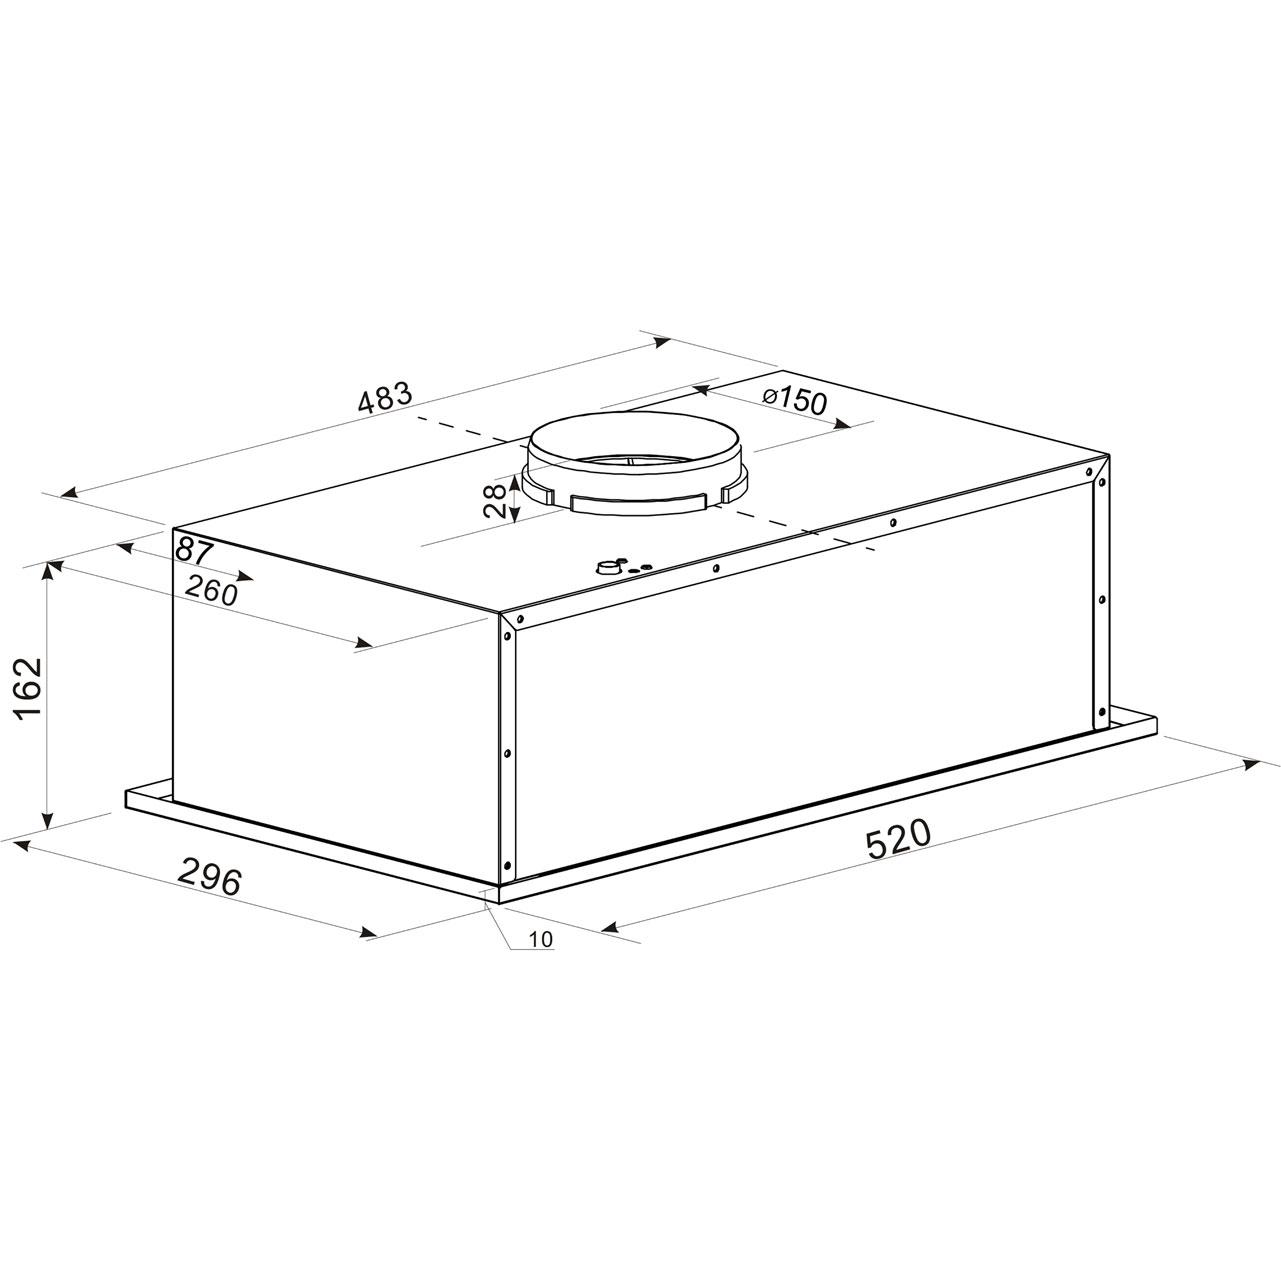 Club Car Battery Gauge Wiring Diagram